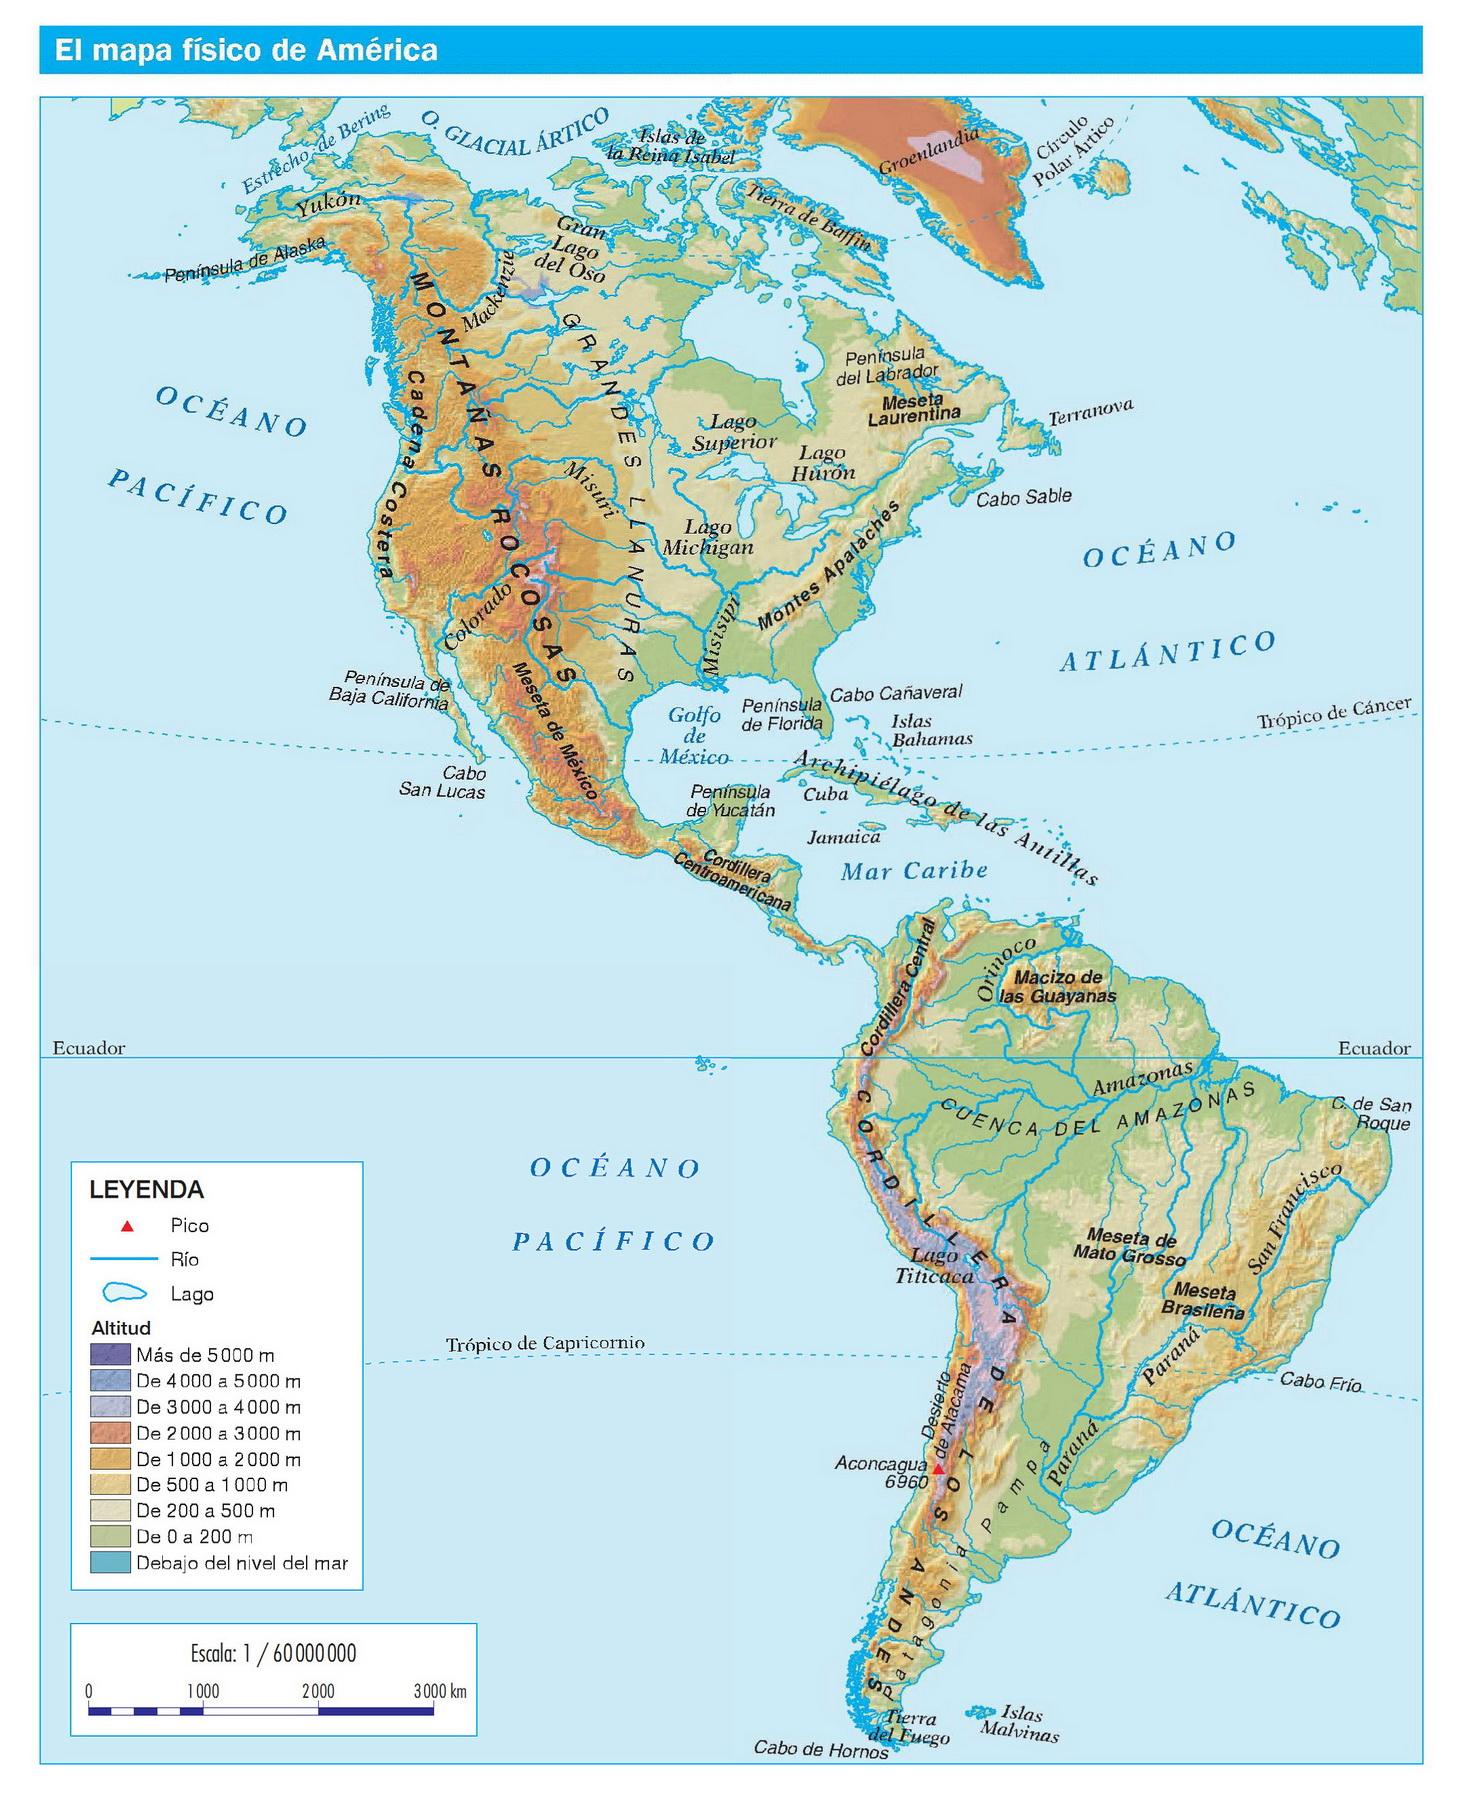 Mapa físico de América.jpg